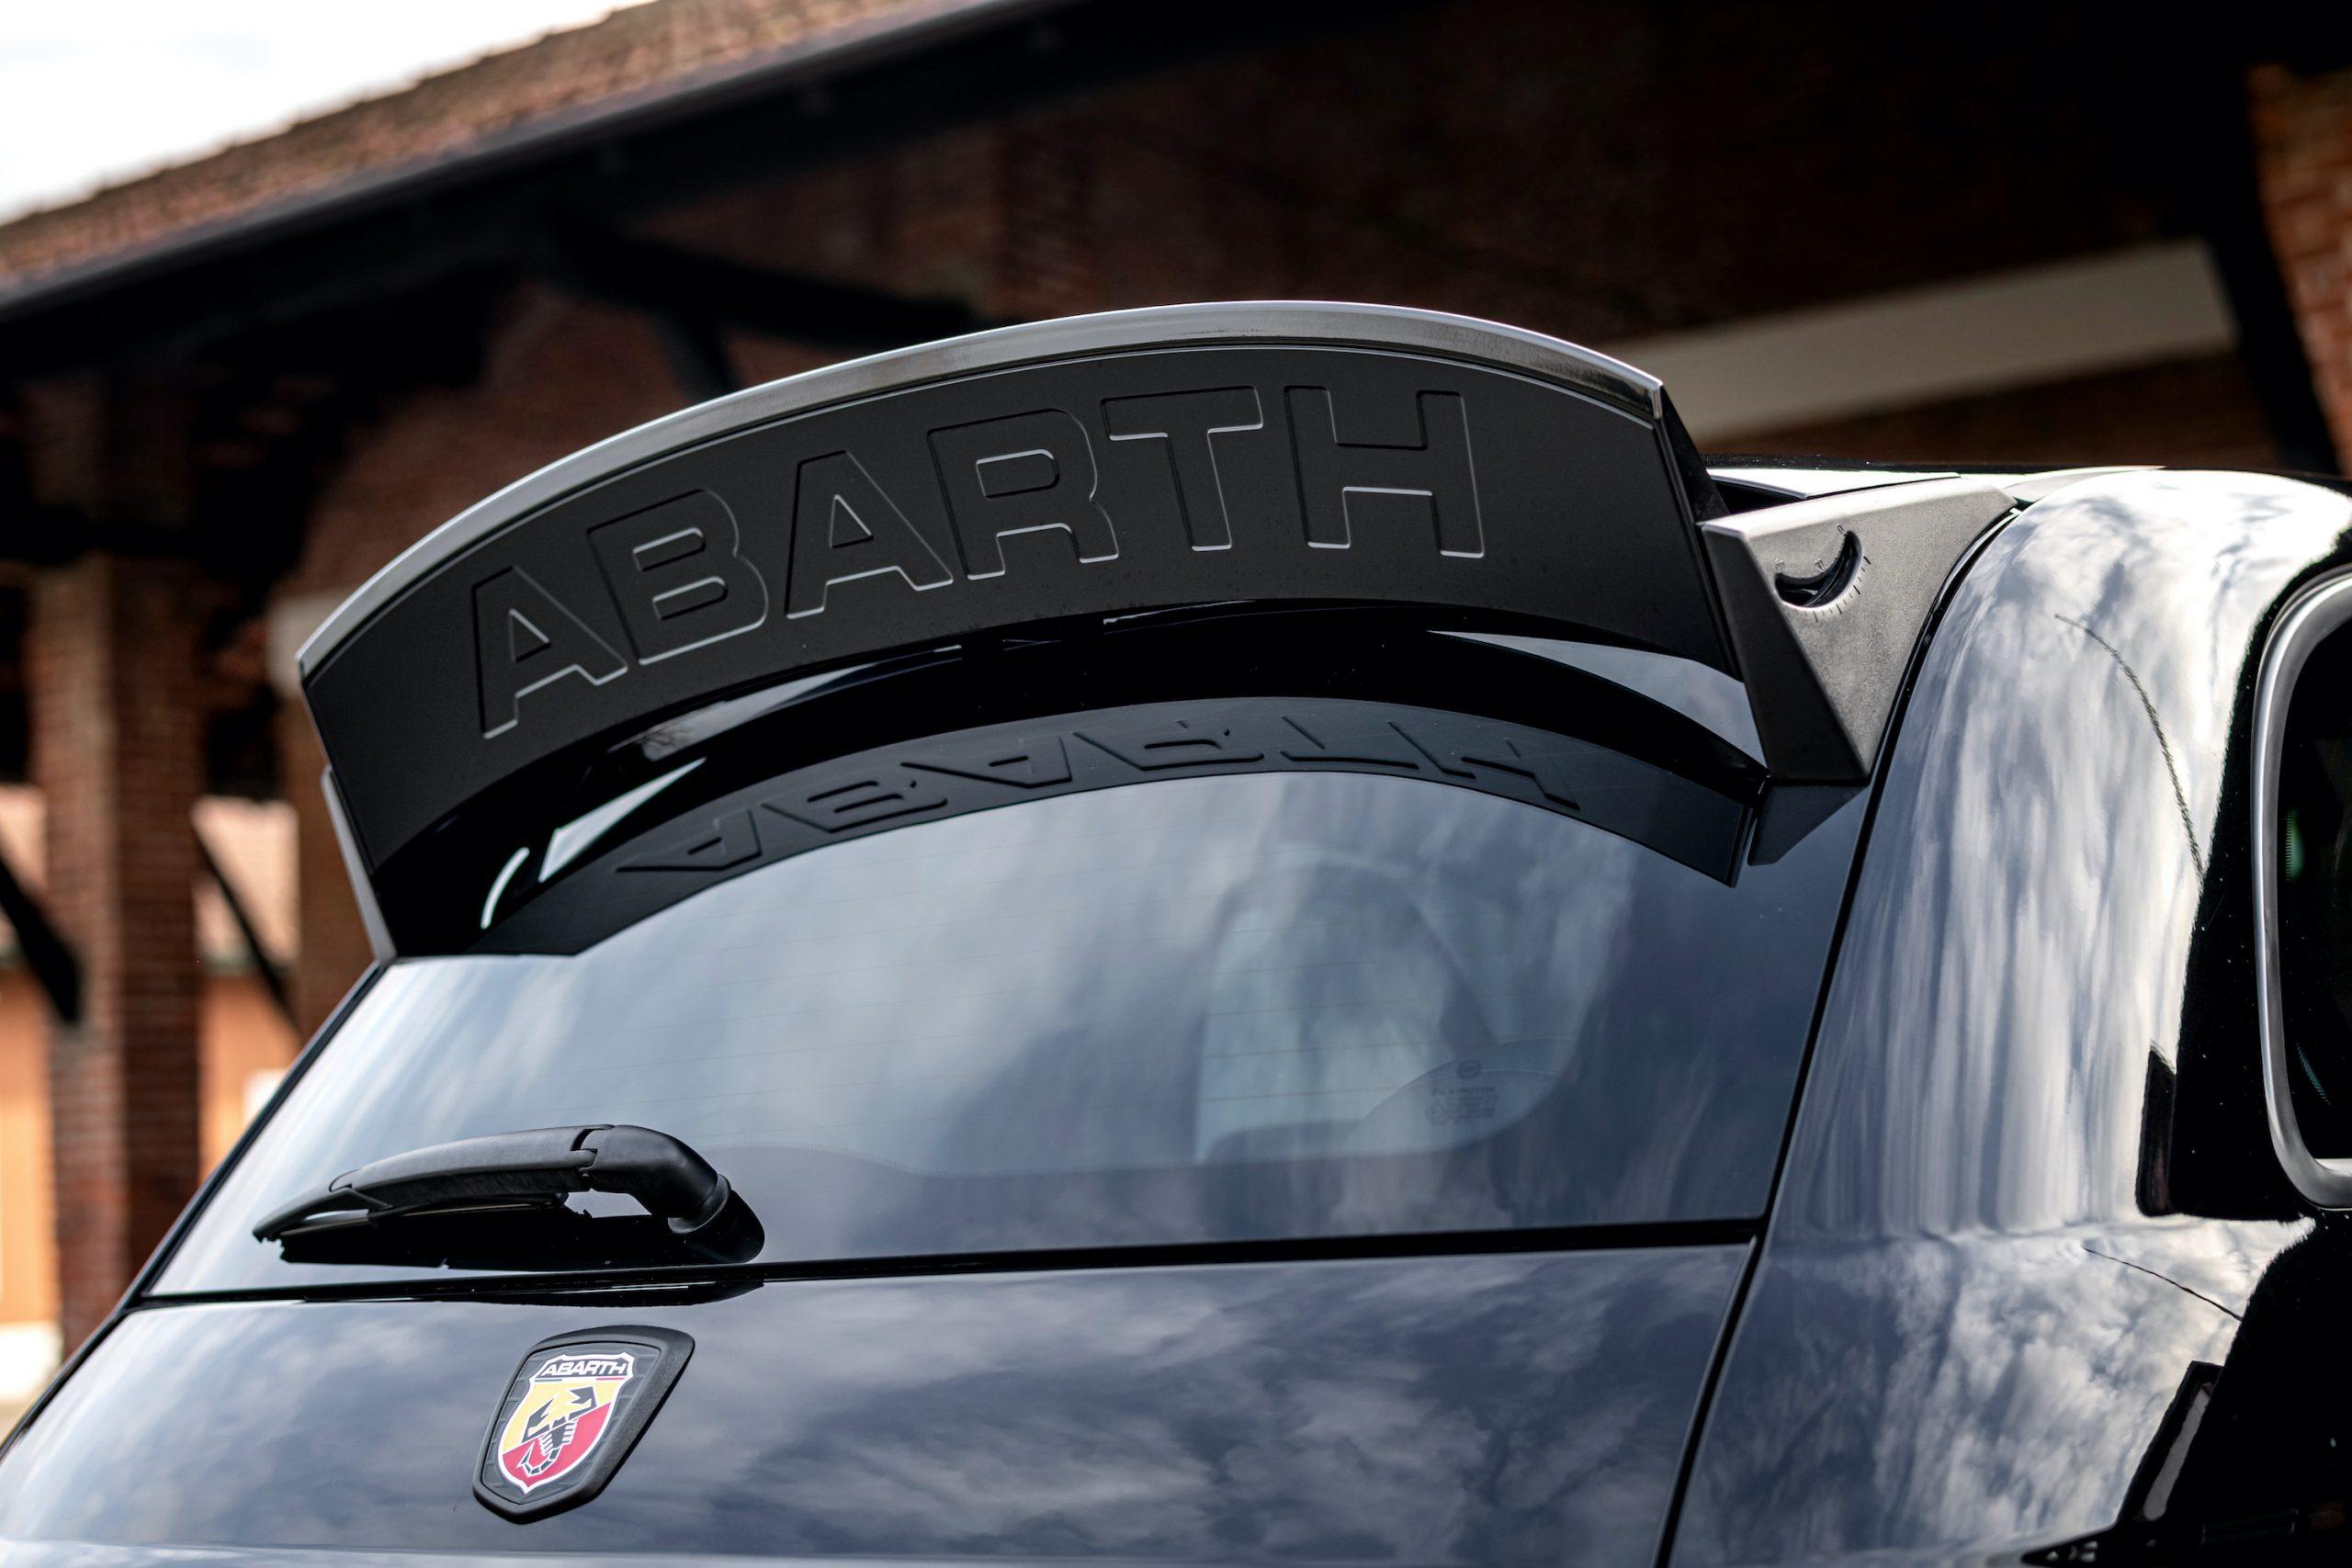 17 New Abarth 695 Esseesse scaled Η Abarth θα φτιάξει μόλις 1.390 συλλεκτικά 695 Εsseesse 500, 695 Esseesse, Abarth, Abarth 695, Abarth 695 Esseesse, Fiat, Fiat 500, videos, zblog, ειδήσεις, Νέα